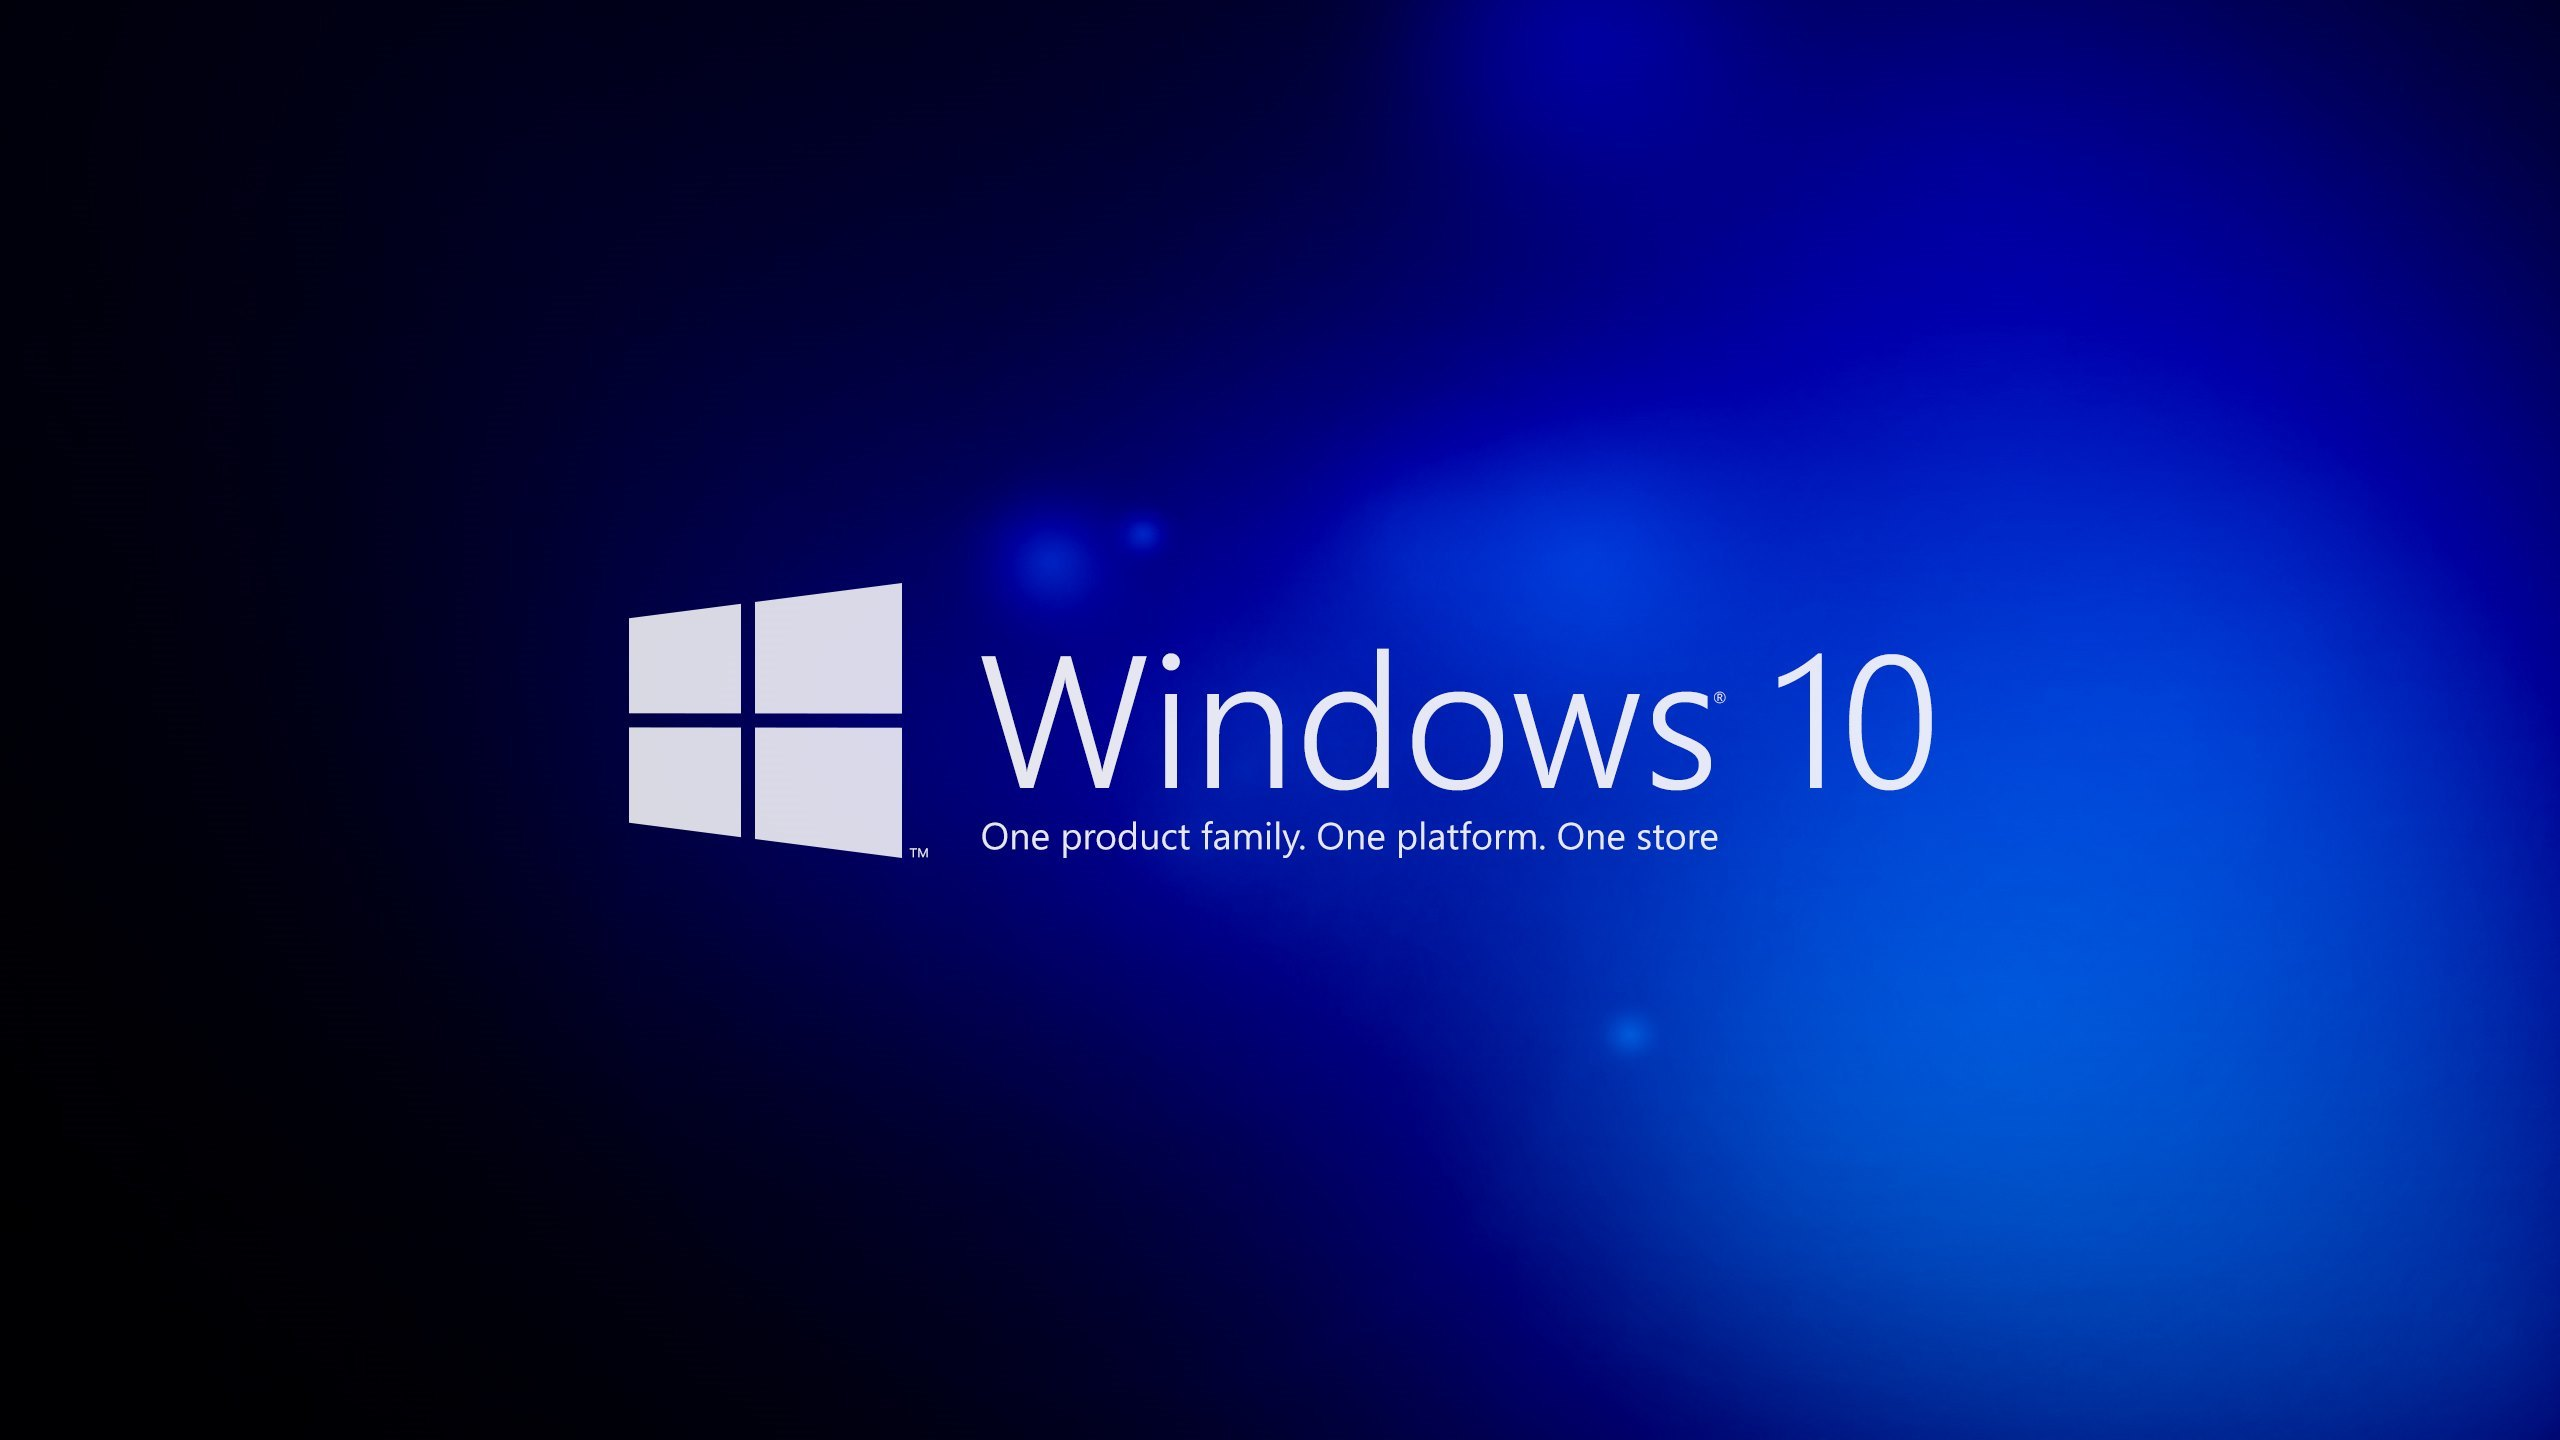 Windows 10 Wallpaper microsoft   Galaxy Note Edge Wallpapers Quad HD 2560x1440